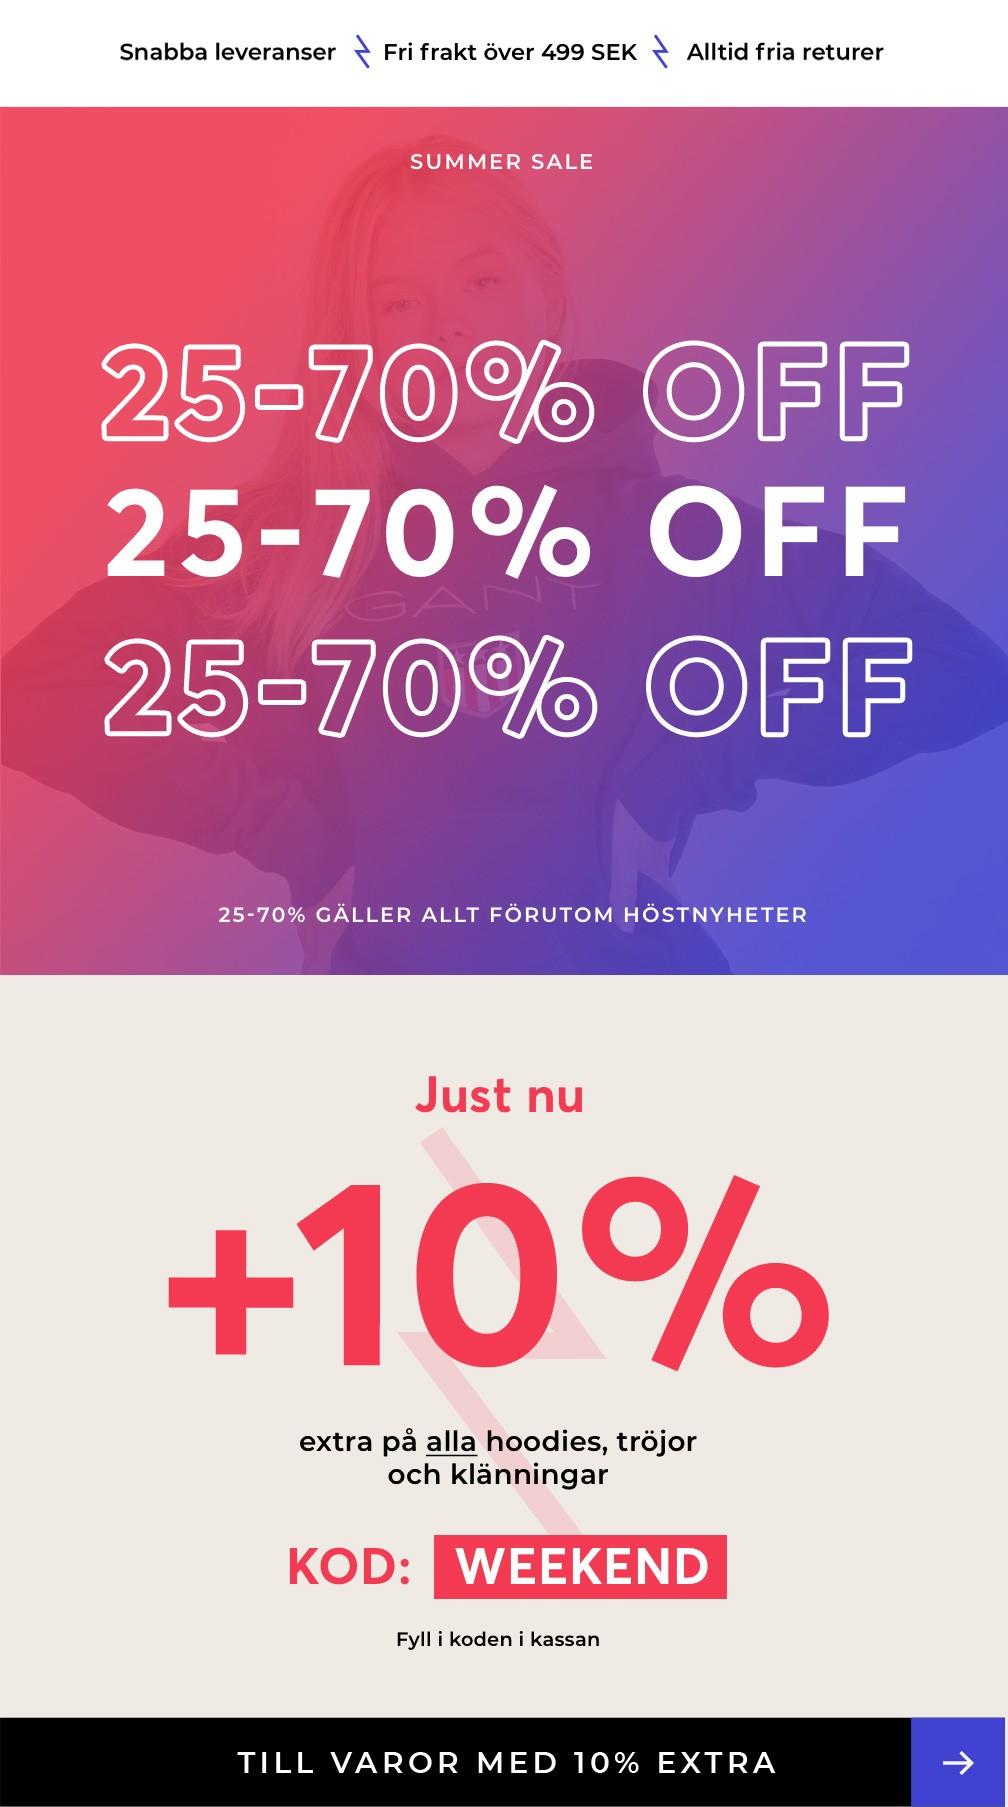 10% EXTRA